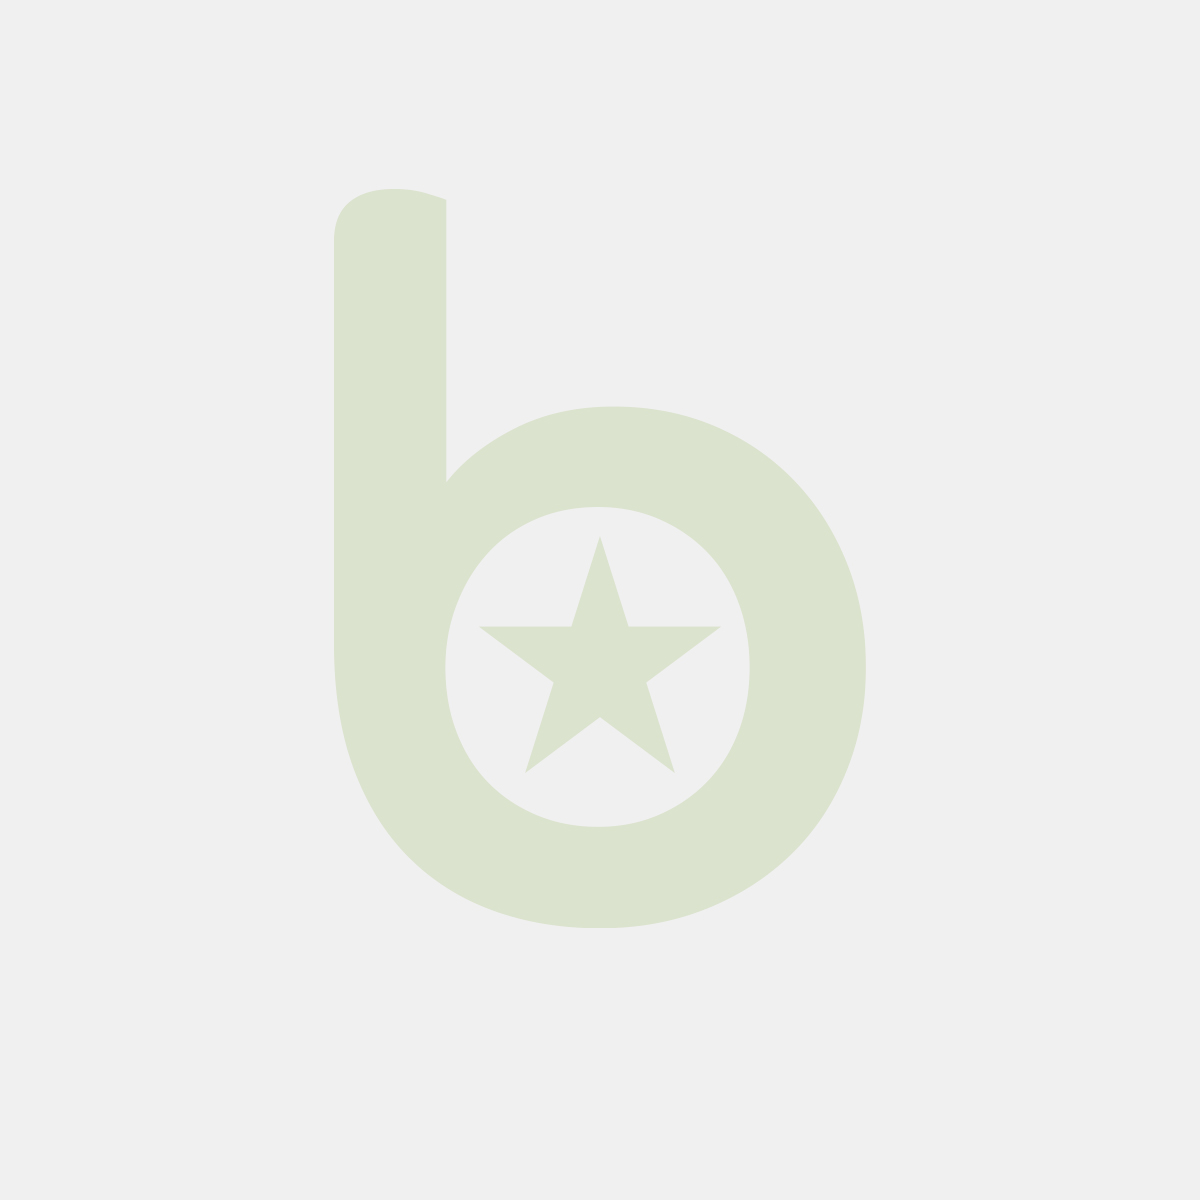 FINGERFOOD - pucharek PS 90ml transparentny 7,2x7,2cm op. 25 sztuk